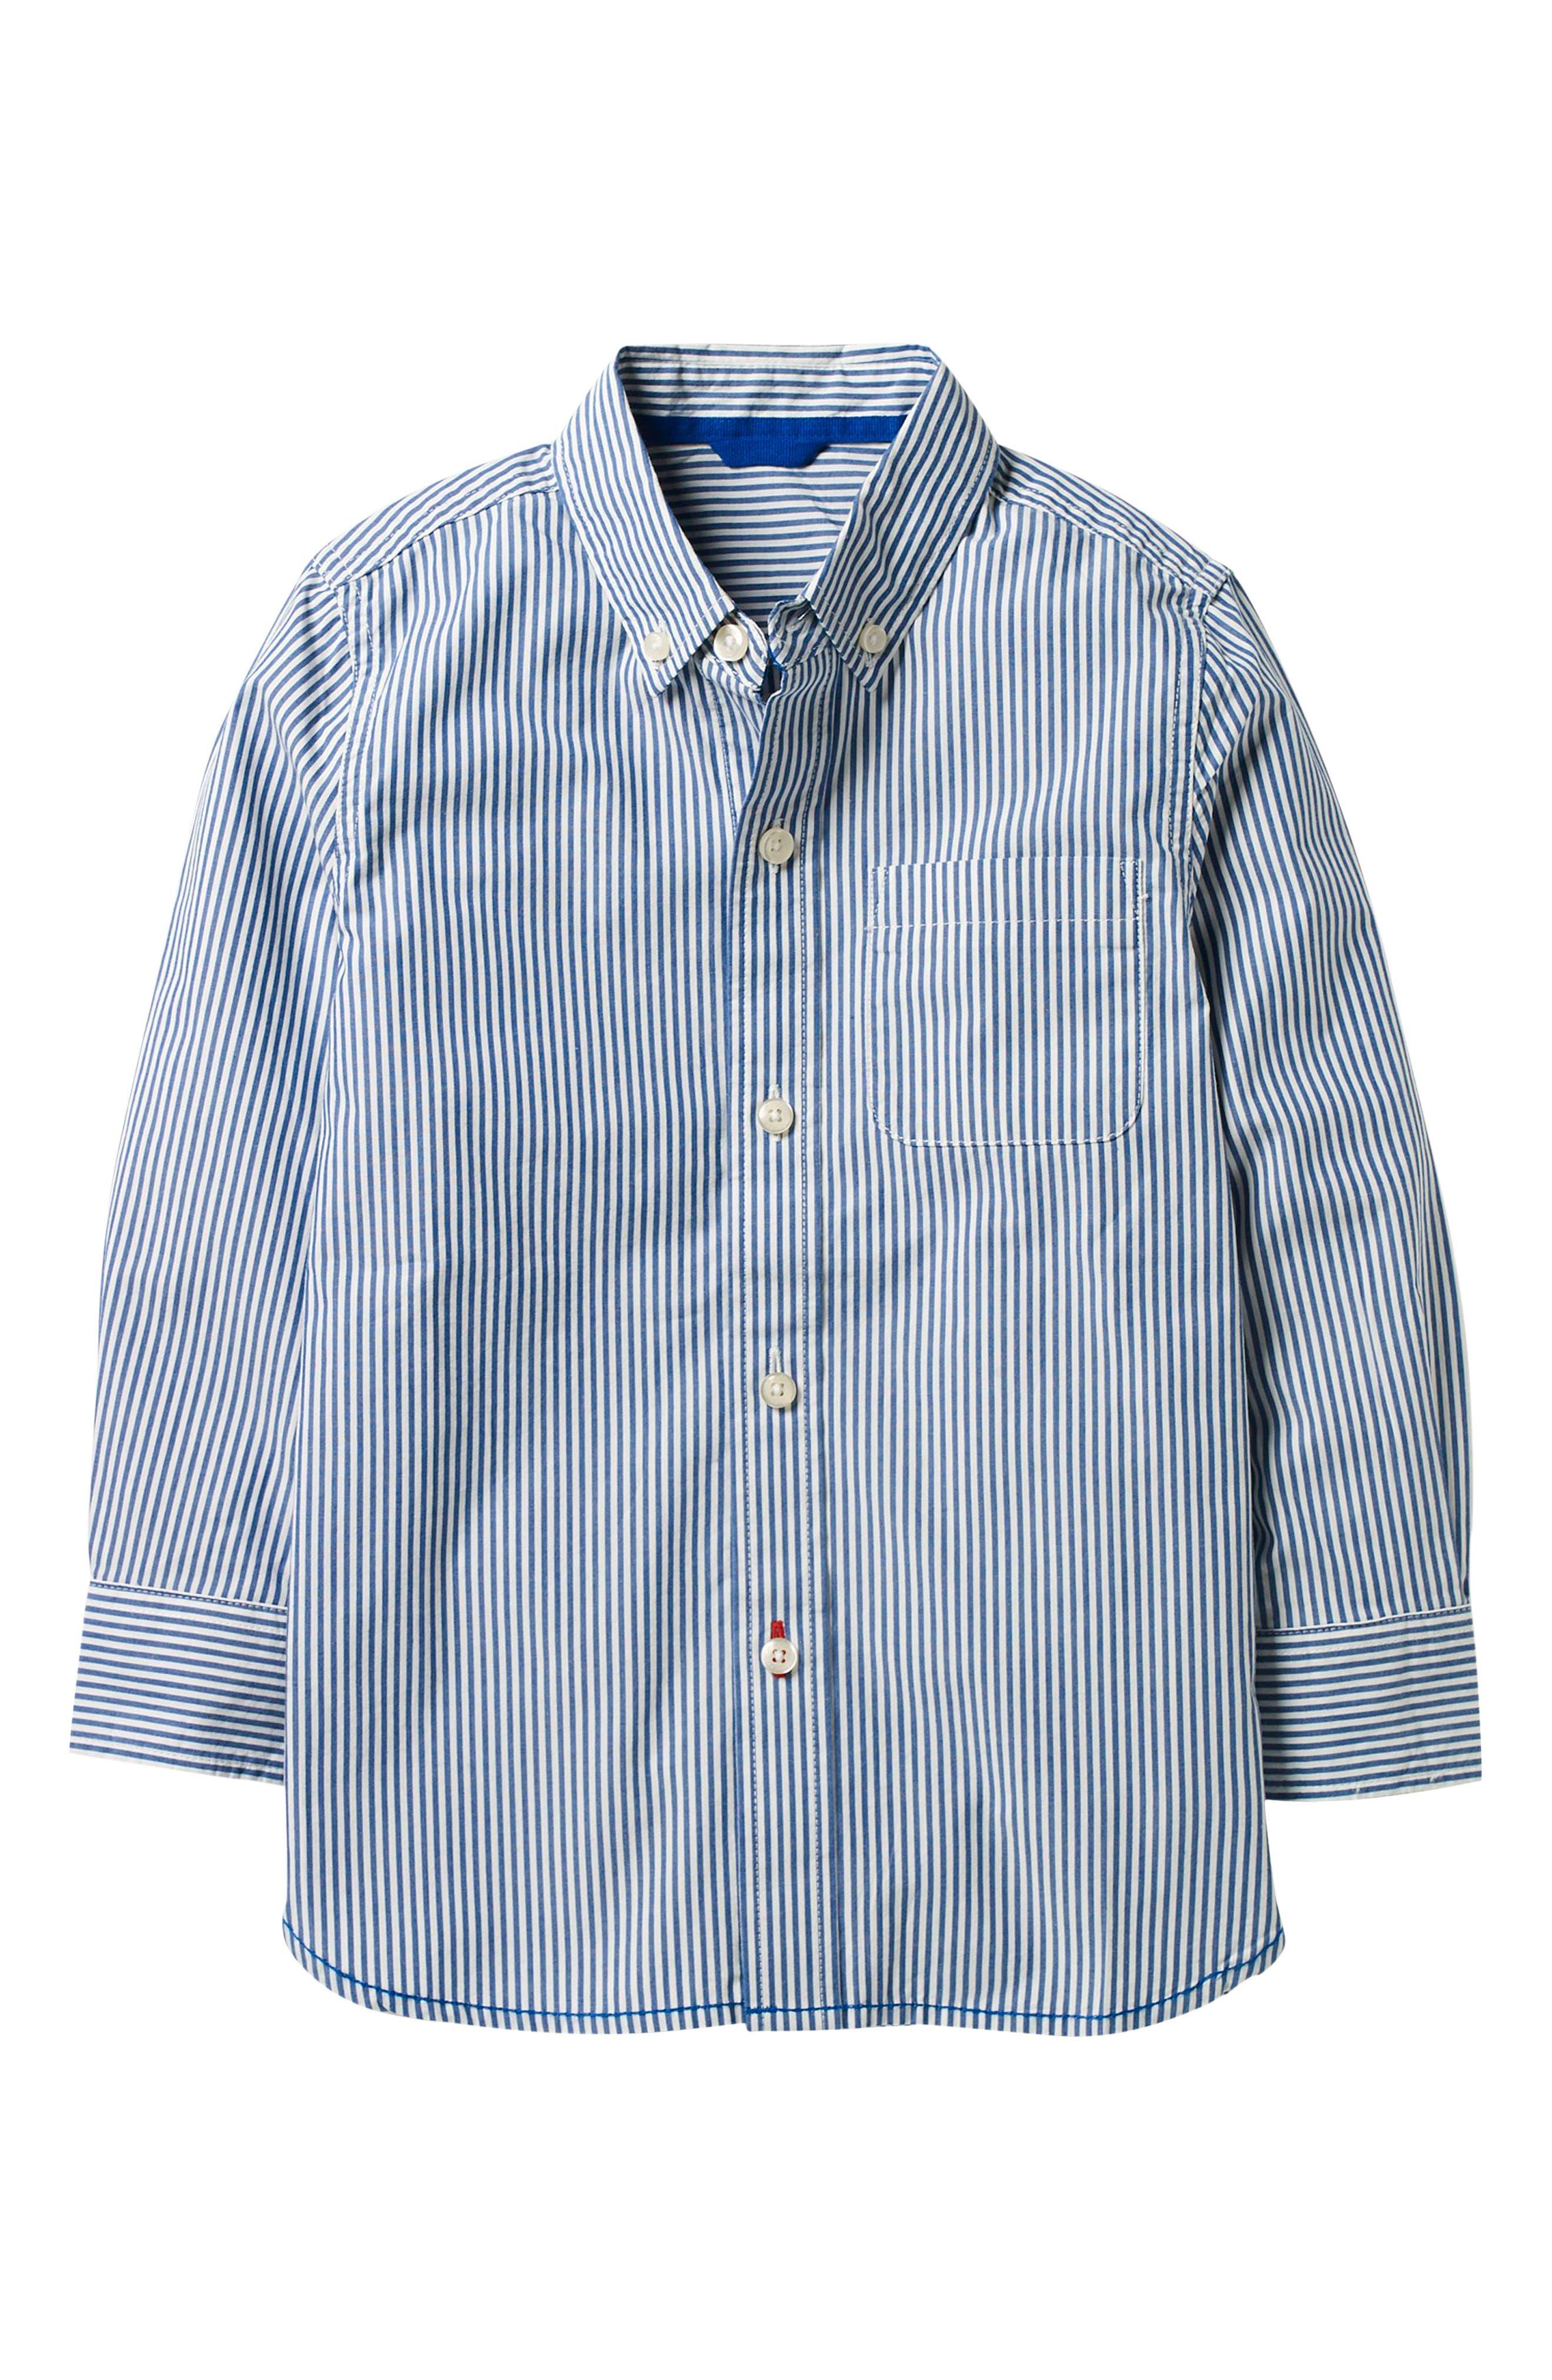 Laundered Stripe Woven Shirt,                             Main thumbnail 1, color,                             454